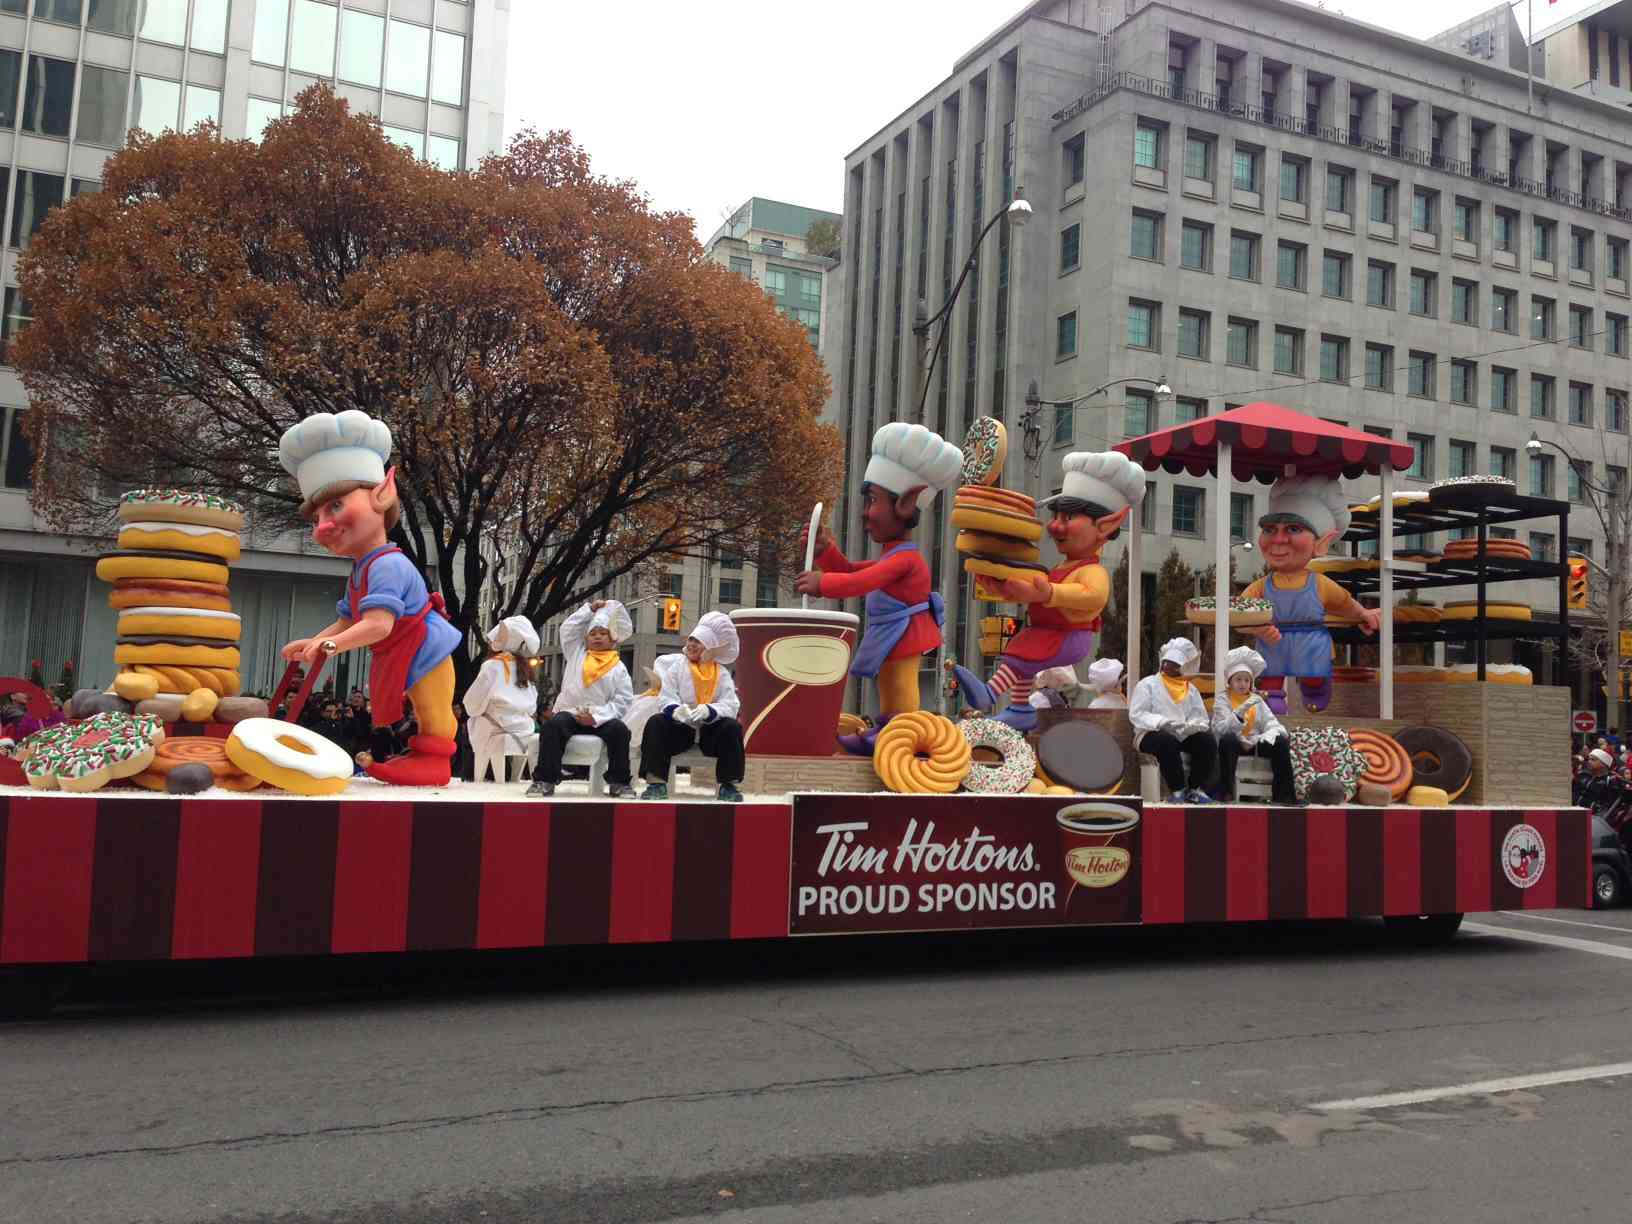 Tim Horton's in Toronto's Santa Claus Parade